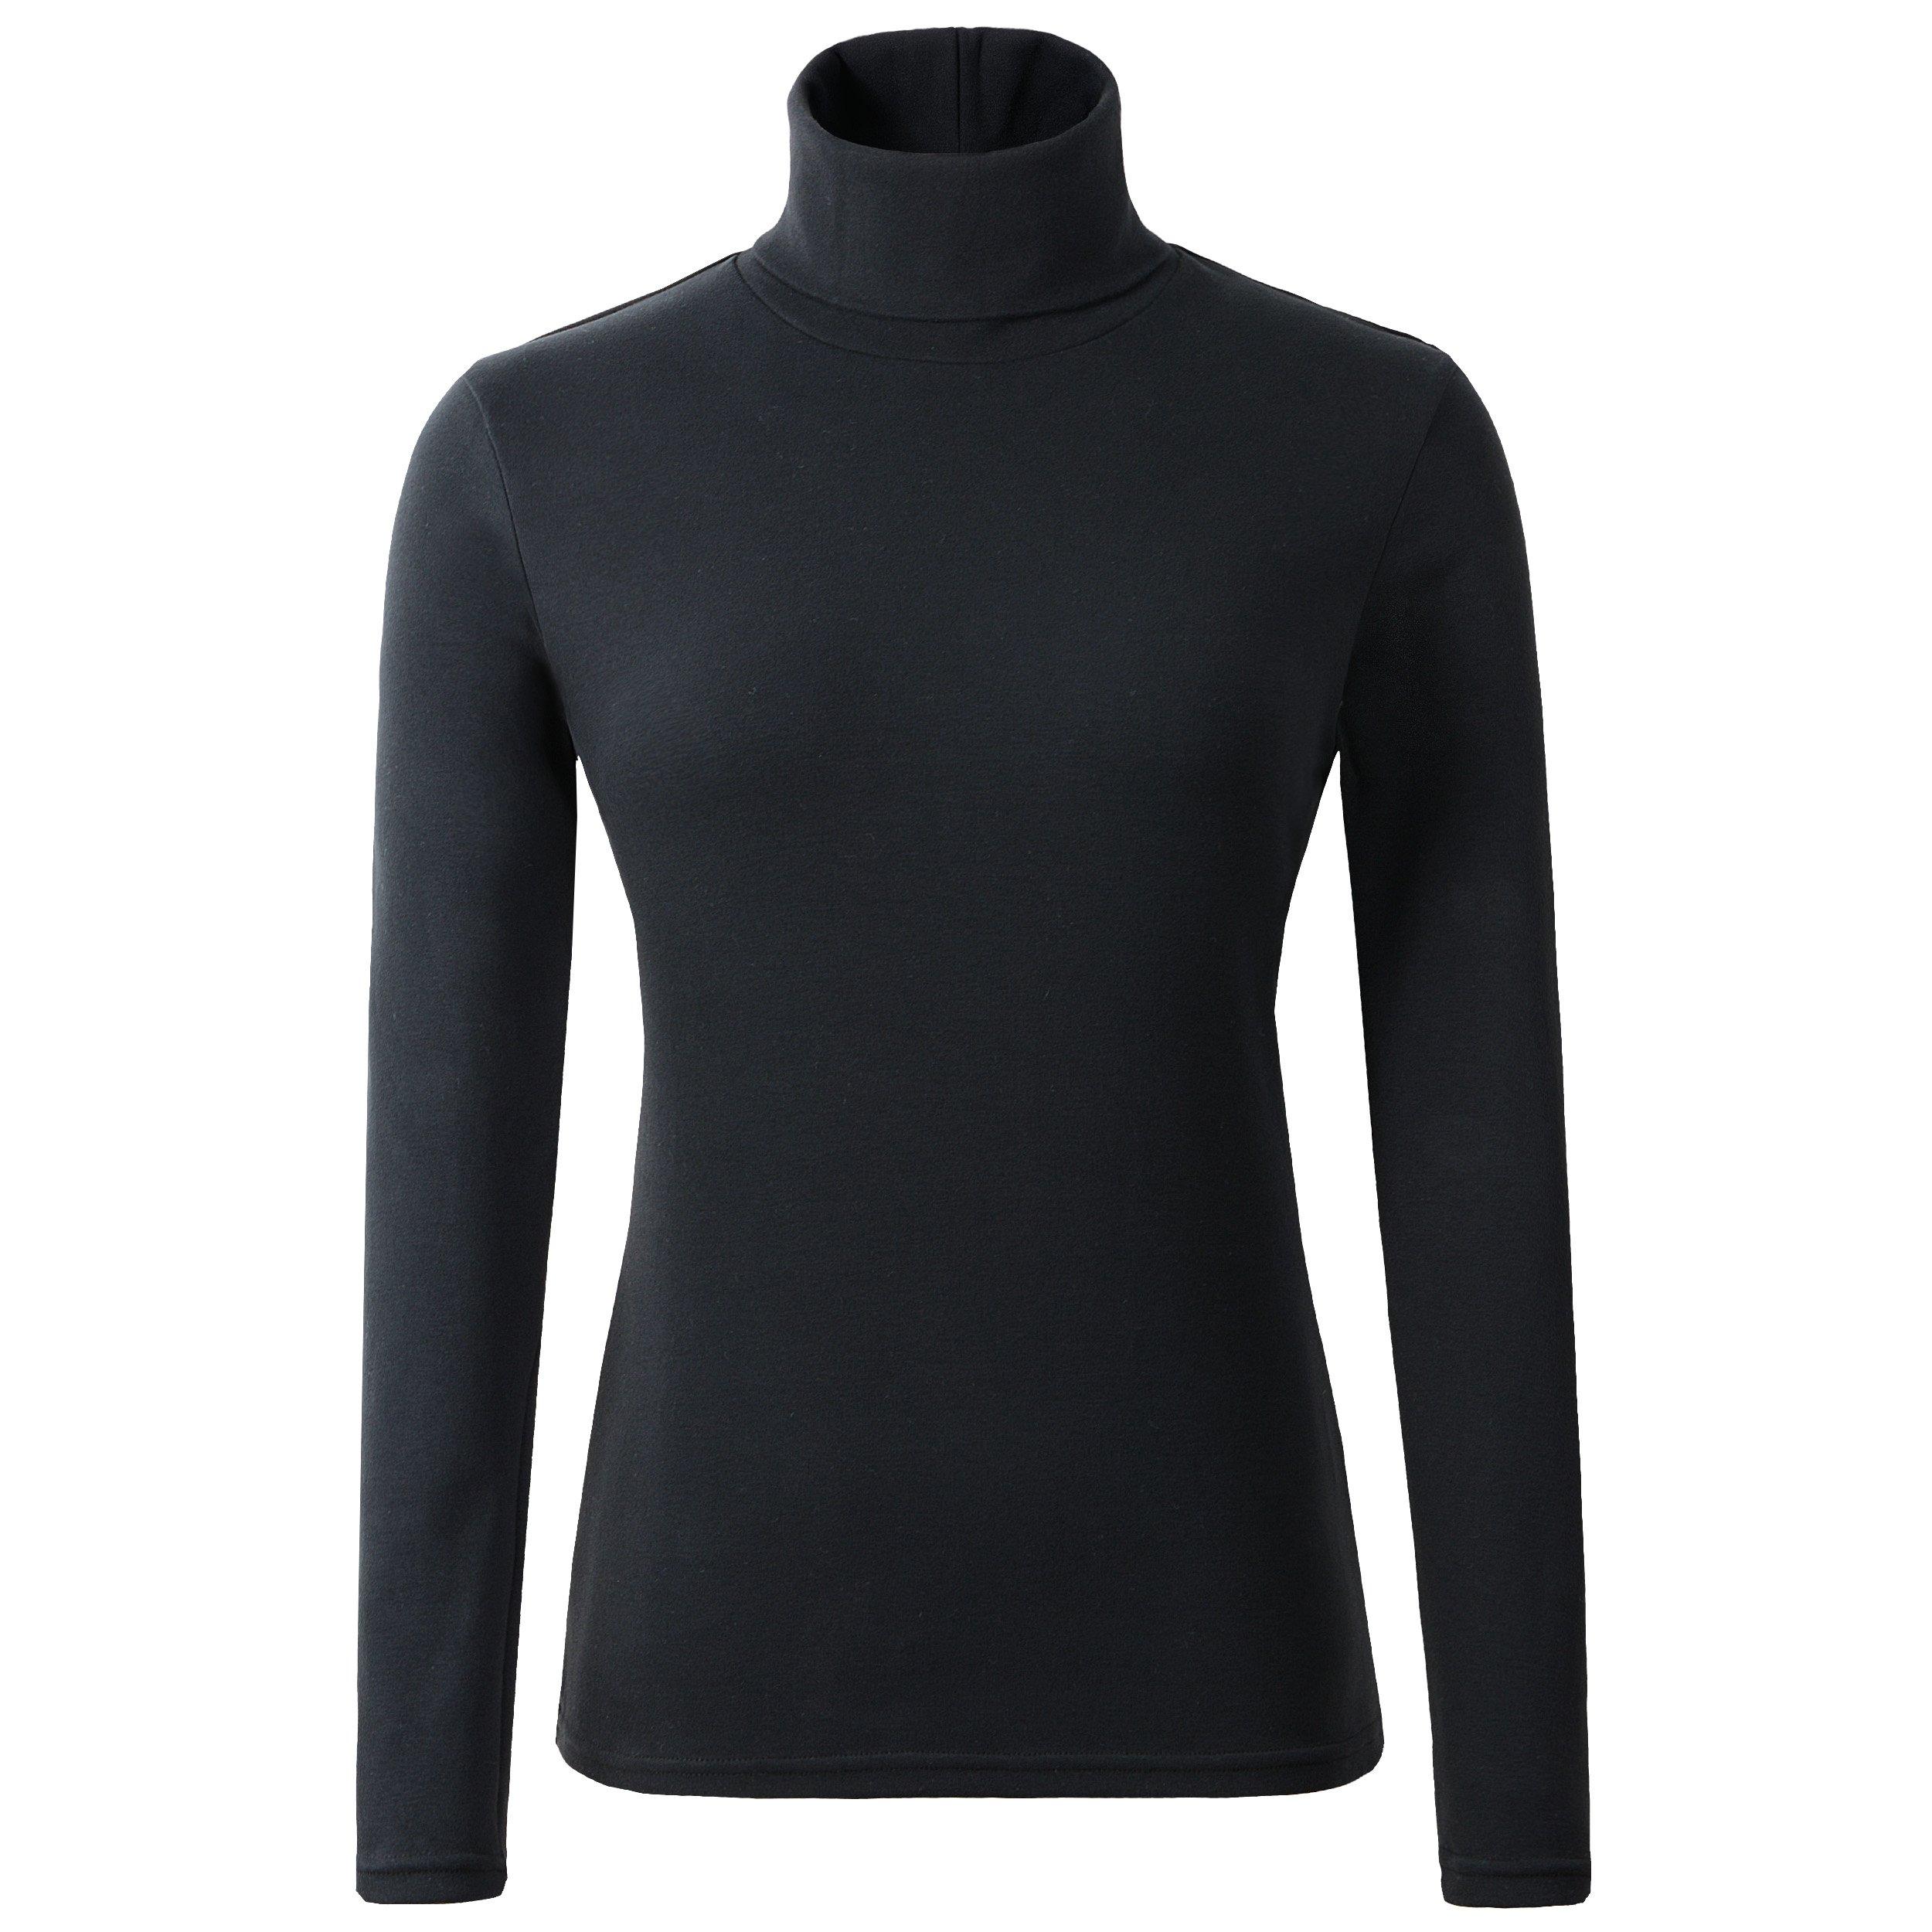 HieasyFit Women's Cotton Basic Thermal Turtleneck Pullover Top Black M by HieasyFit